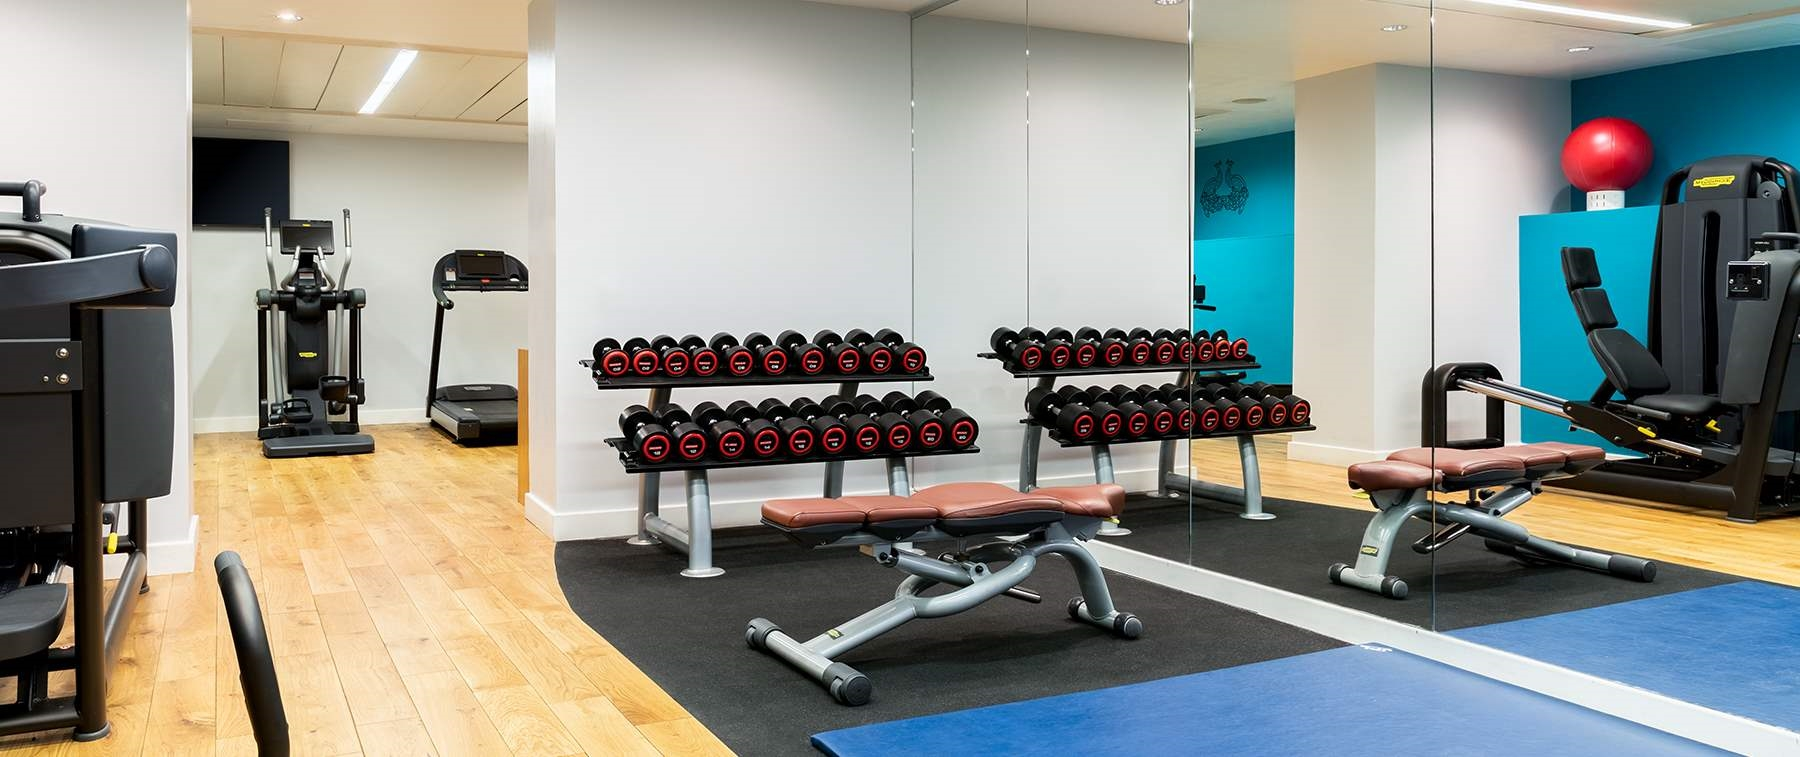 Fitness Center - St. Pancras Spa